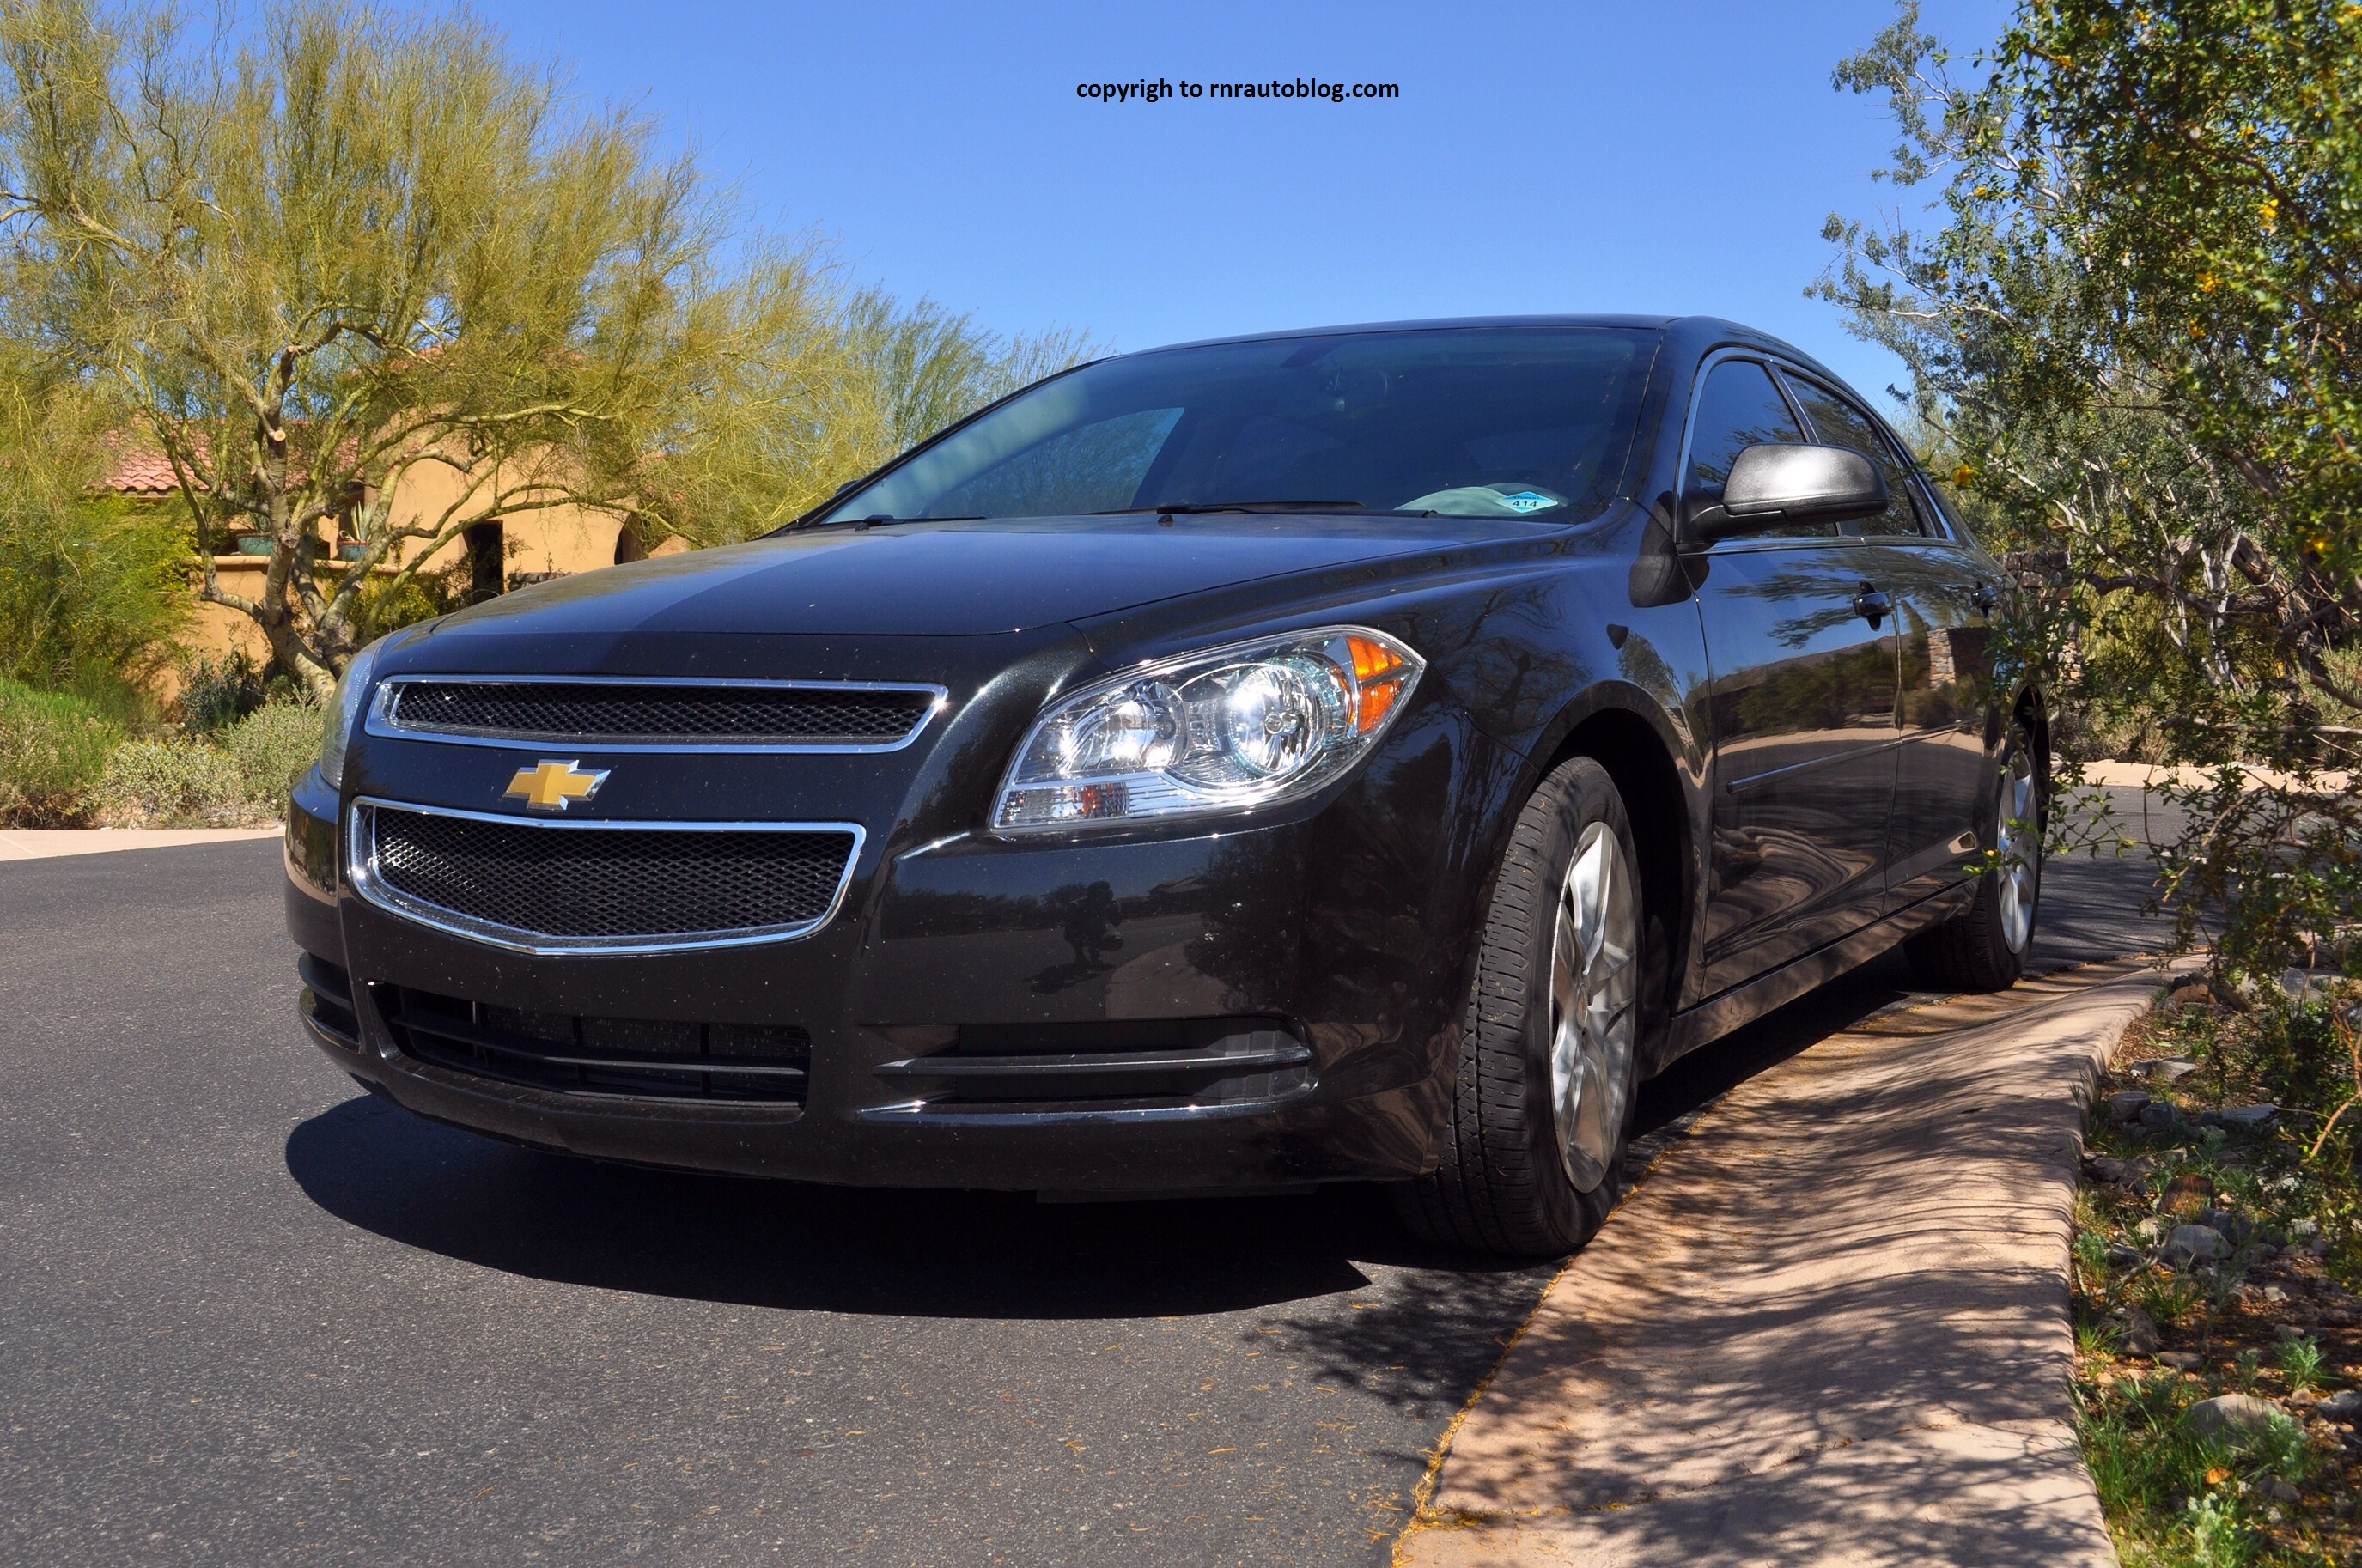 2012 Chevrolet Malibu Ls Review Rnr Automotive Blog